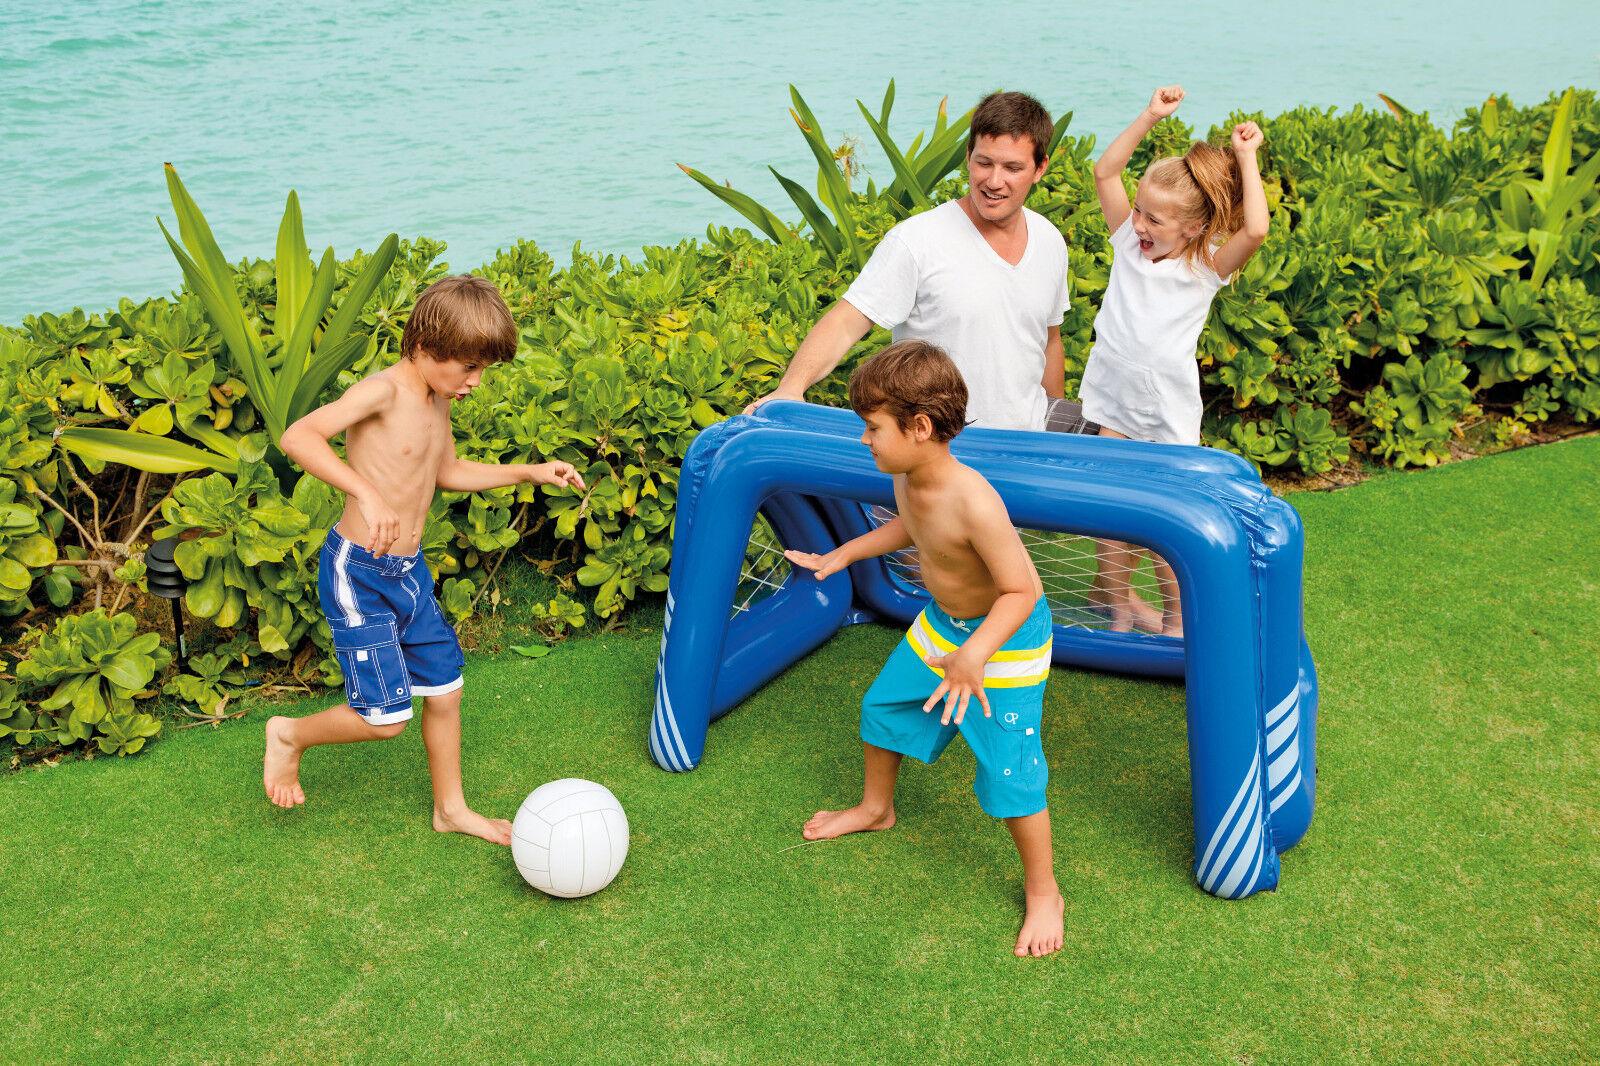 Intex Fun Goal Fussballtor aufblasbares Wasserballtor Ball Pool Fussball , (K)